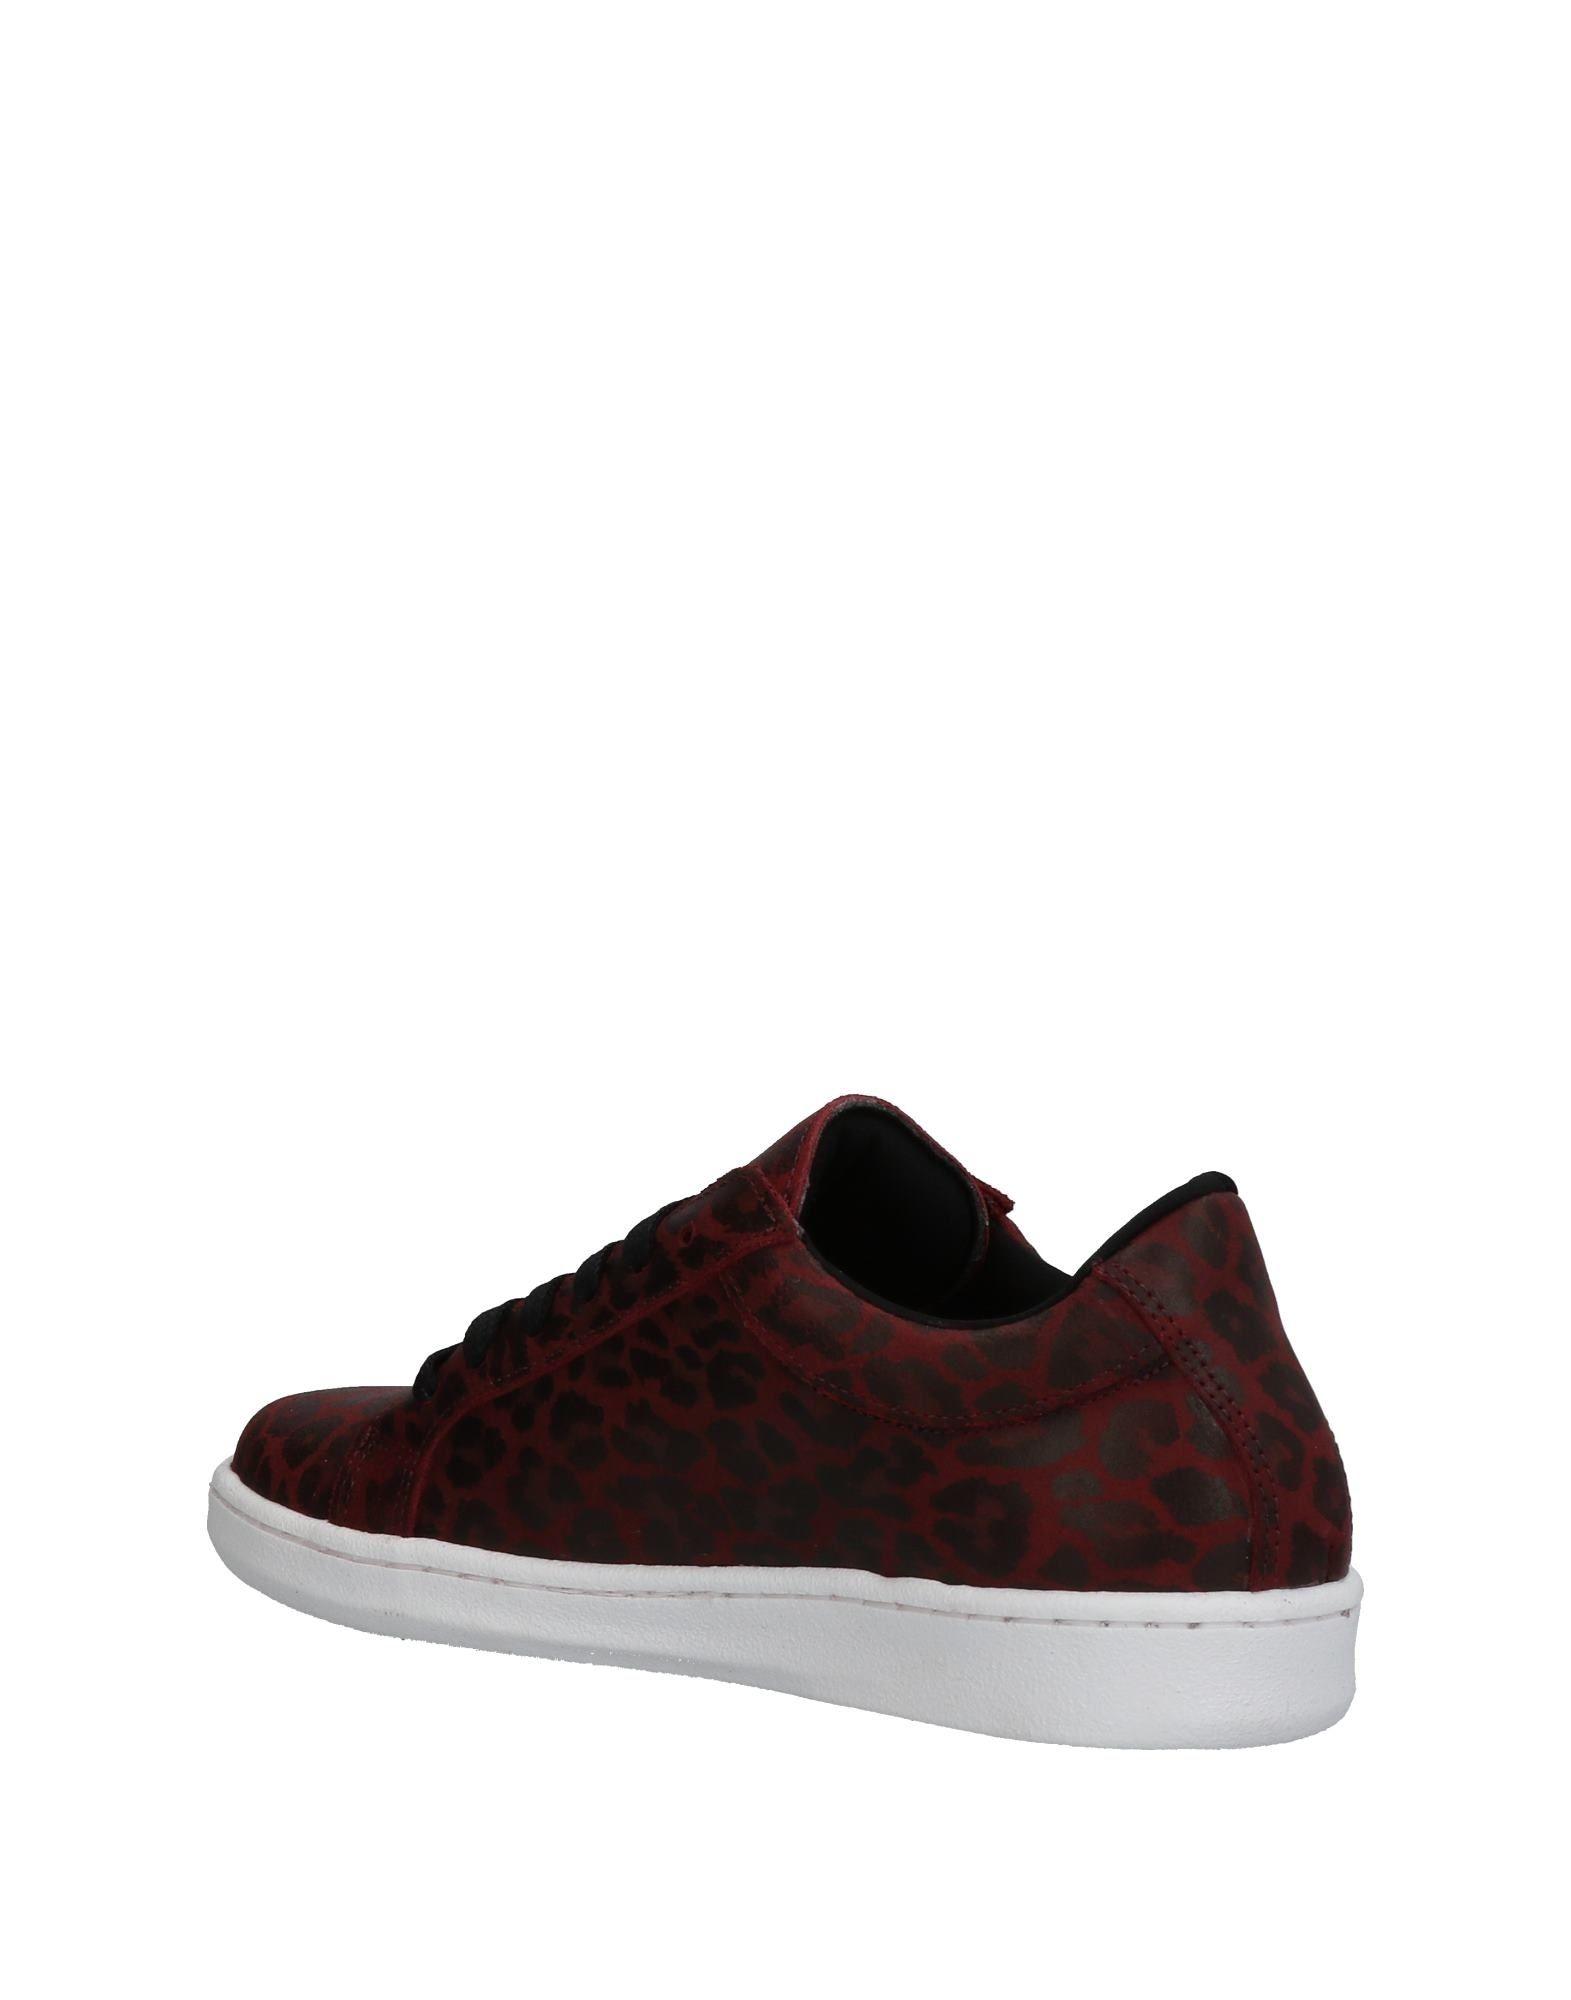 Sneakers Cuplé Femme - Sneakers Cuplé sur